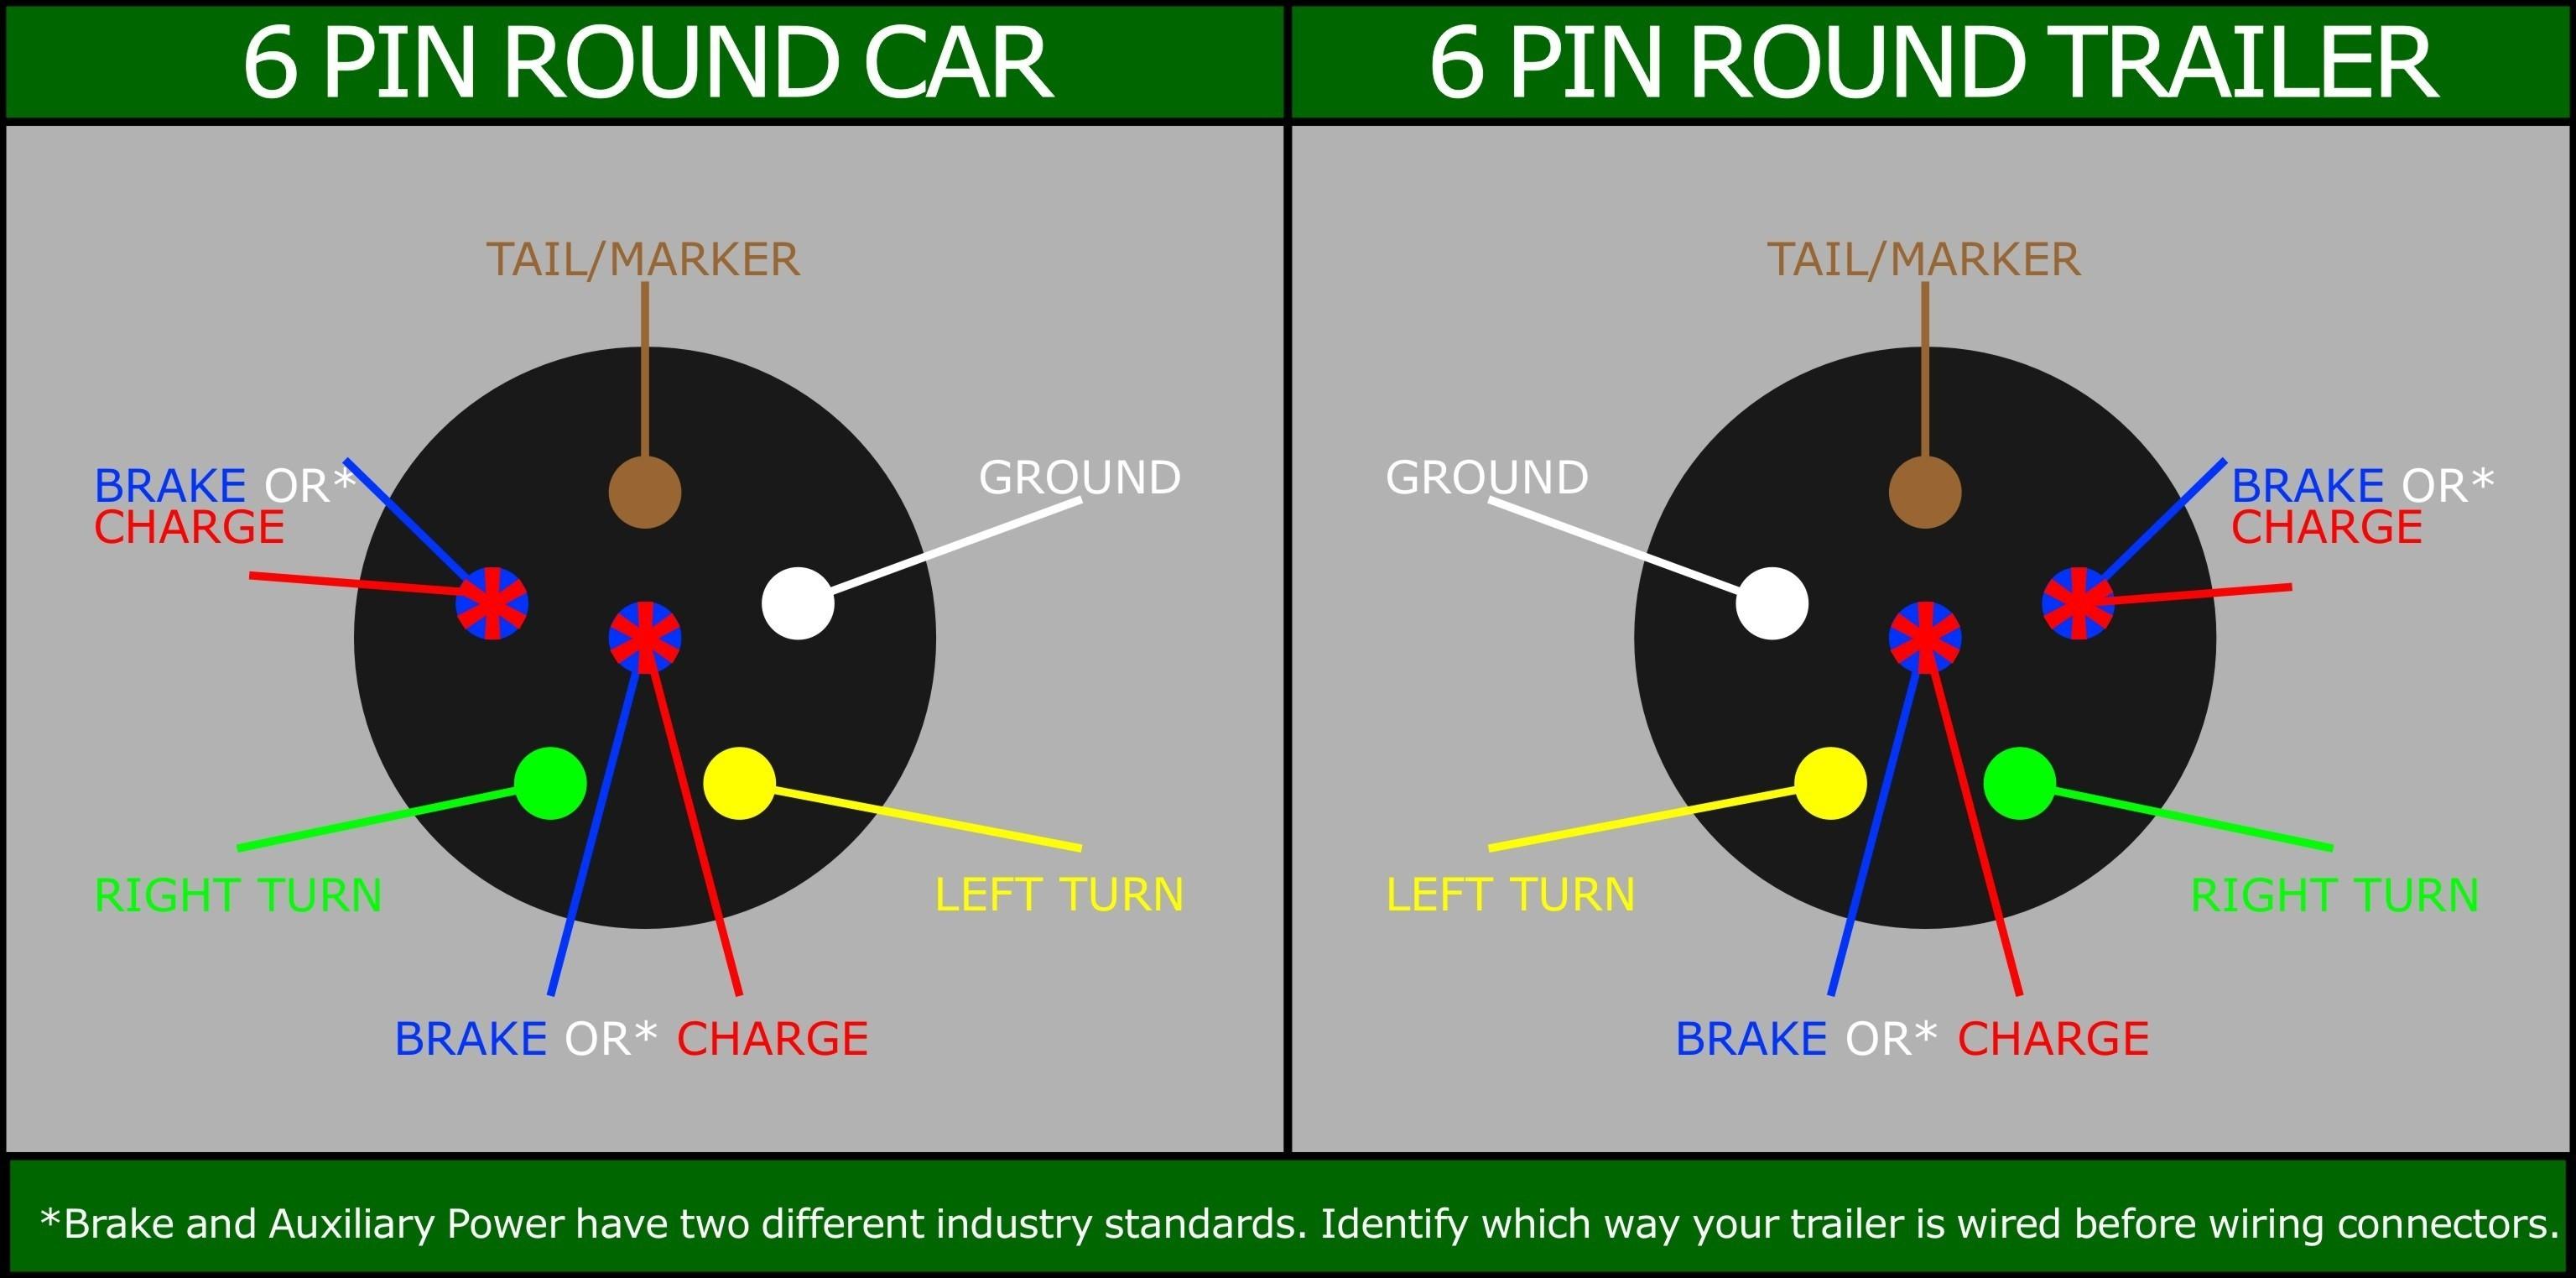 trailer wiring diagram 6 pin inspirational wiring diagram image rh mainetreasurechest com Reese 7 Pin Wiring Diagram Six Pin Trailer Wiring Diagram